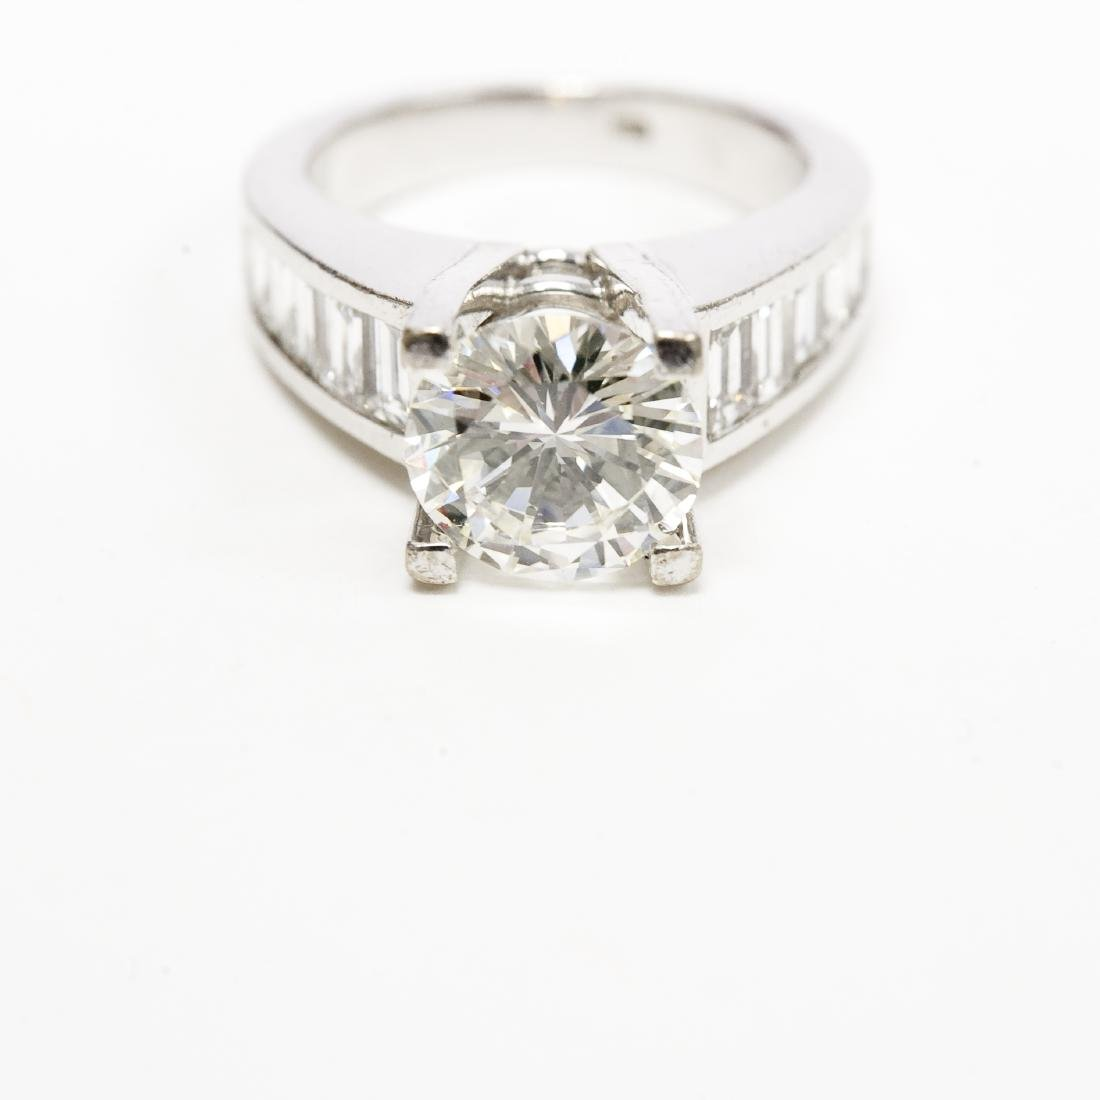 18K White Gold & Diamond Ring. 2.17 ct Center Diamond. - 8